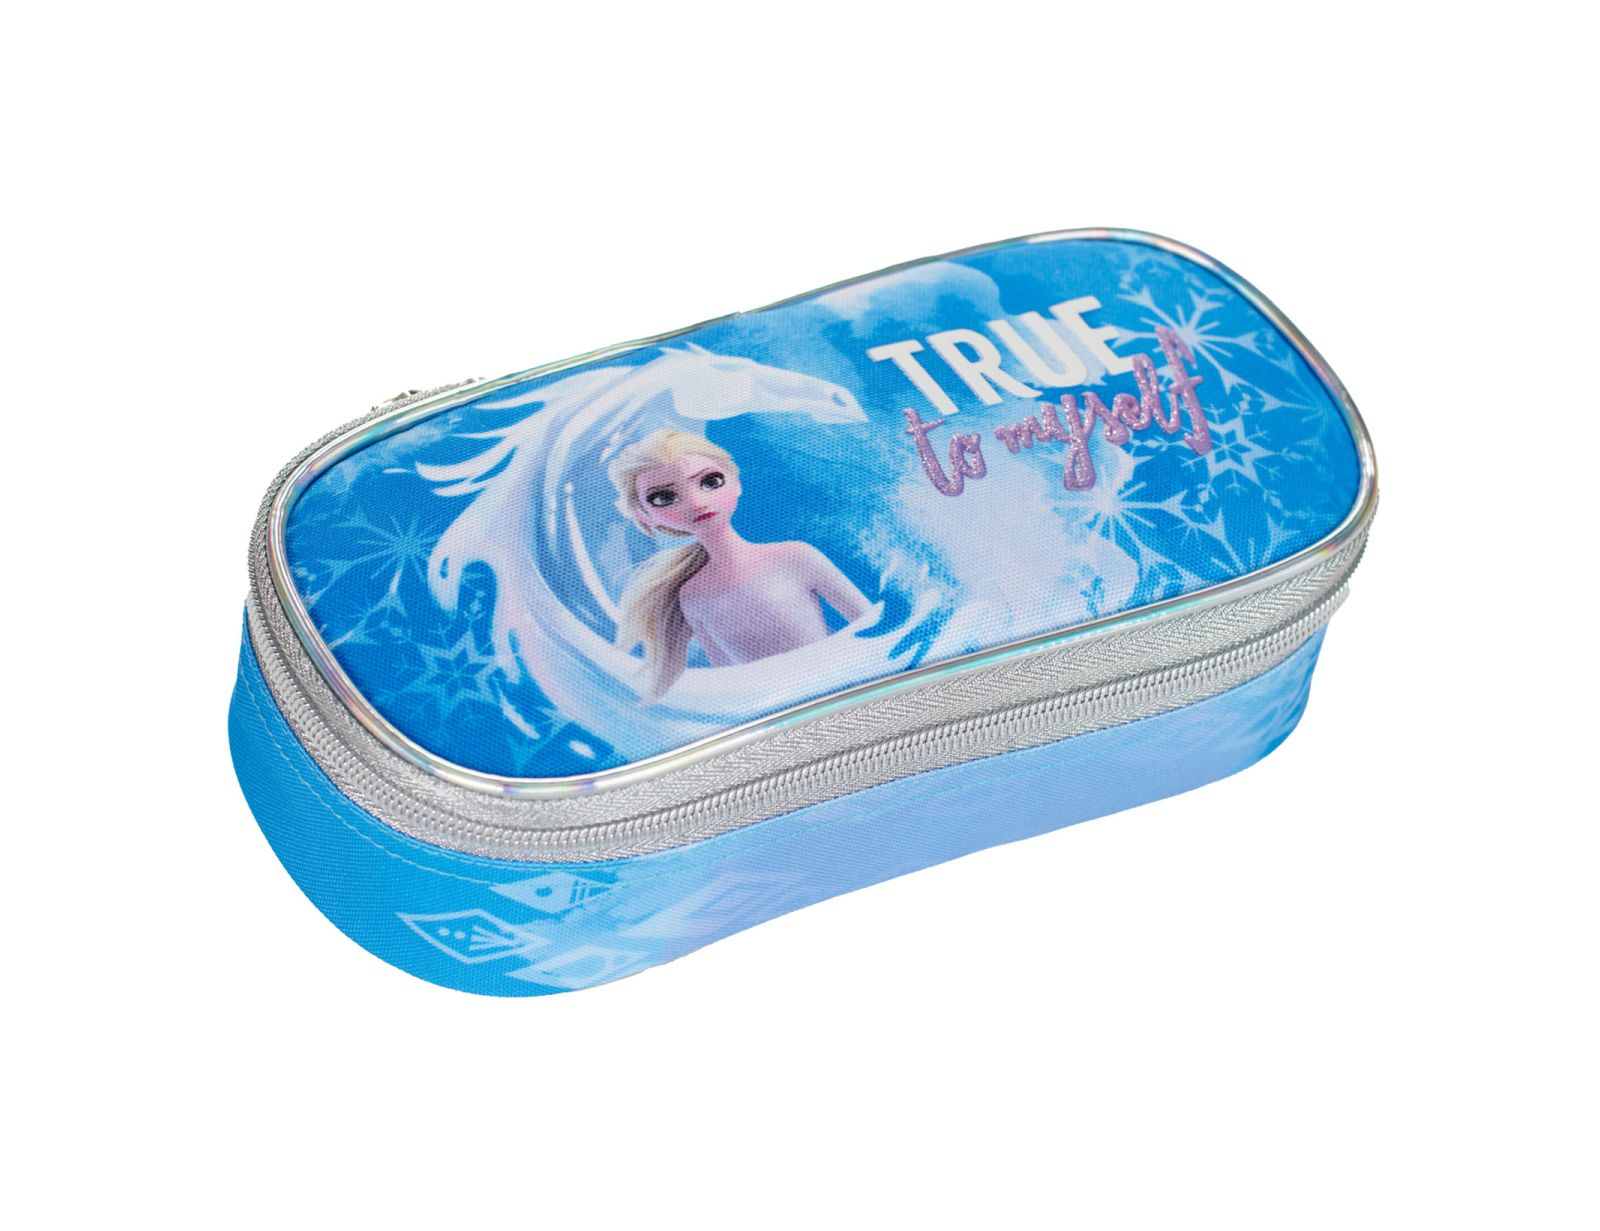 Frozen20 bustina ovale - Frozen